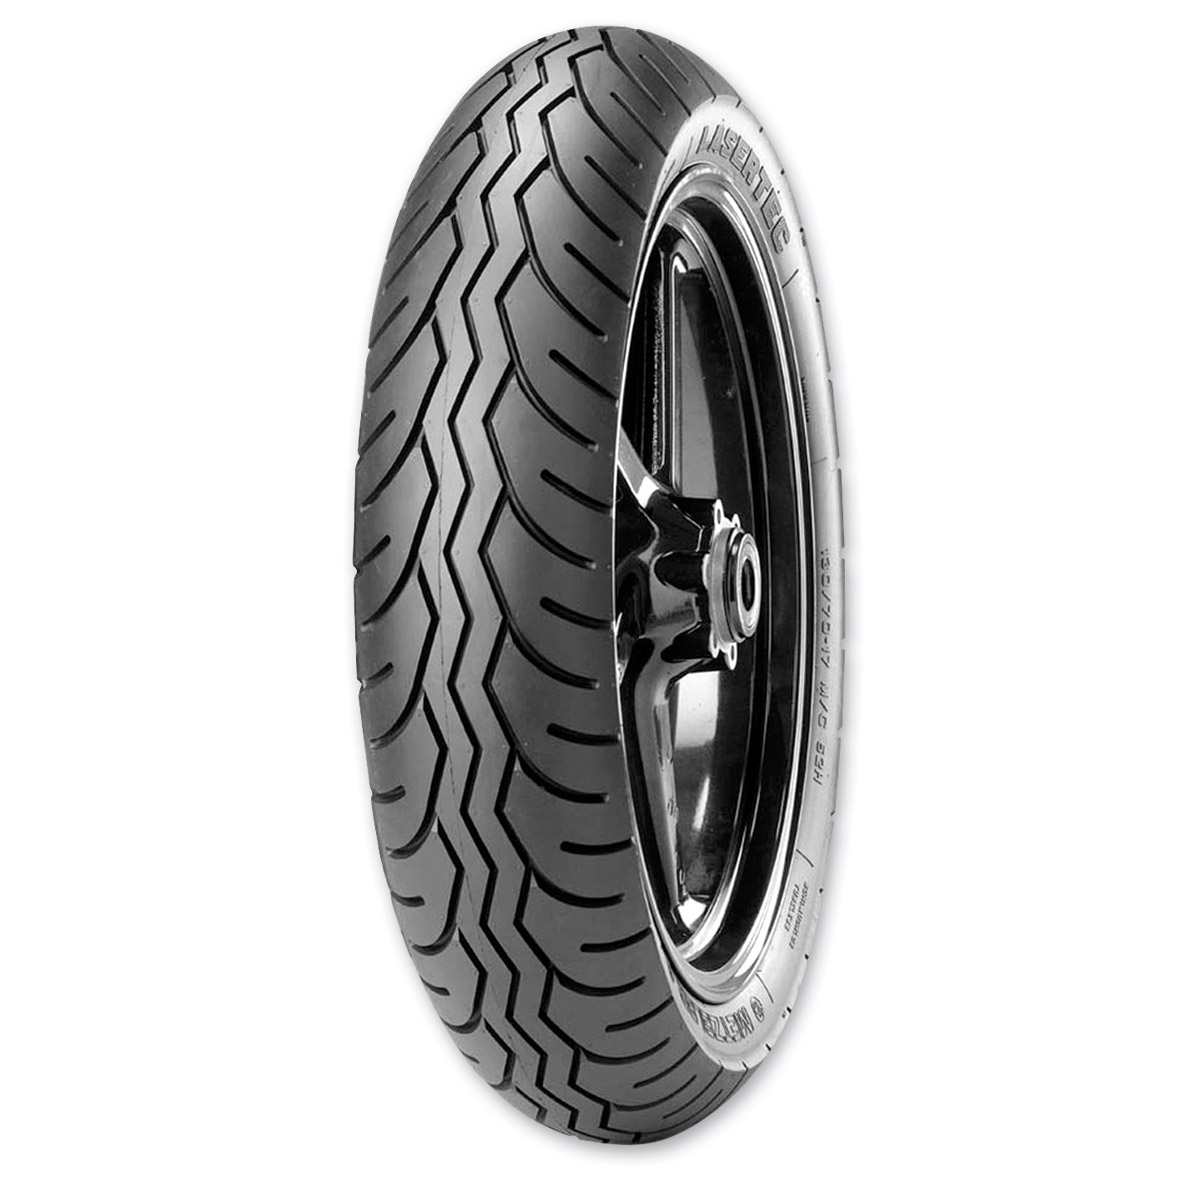 Metzeler Lasertec 130/80-18 Rear Tire